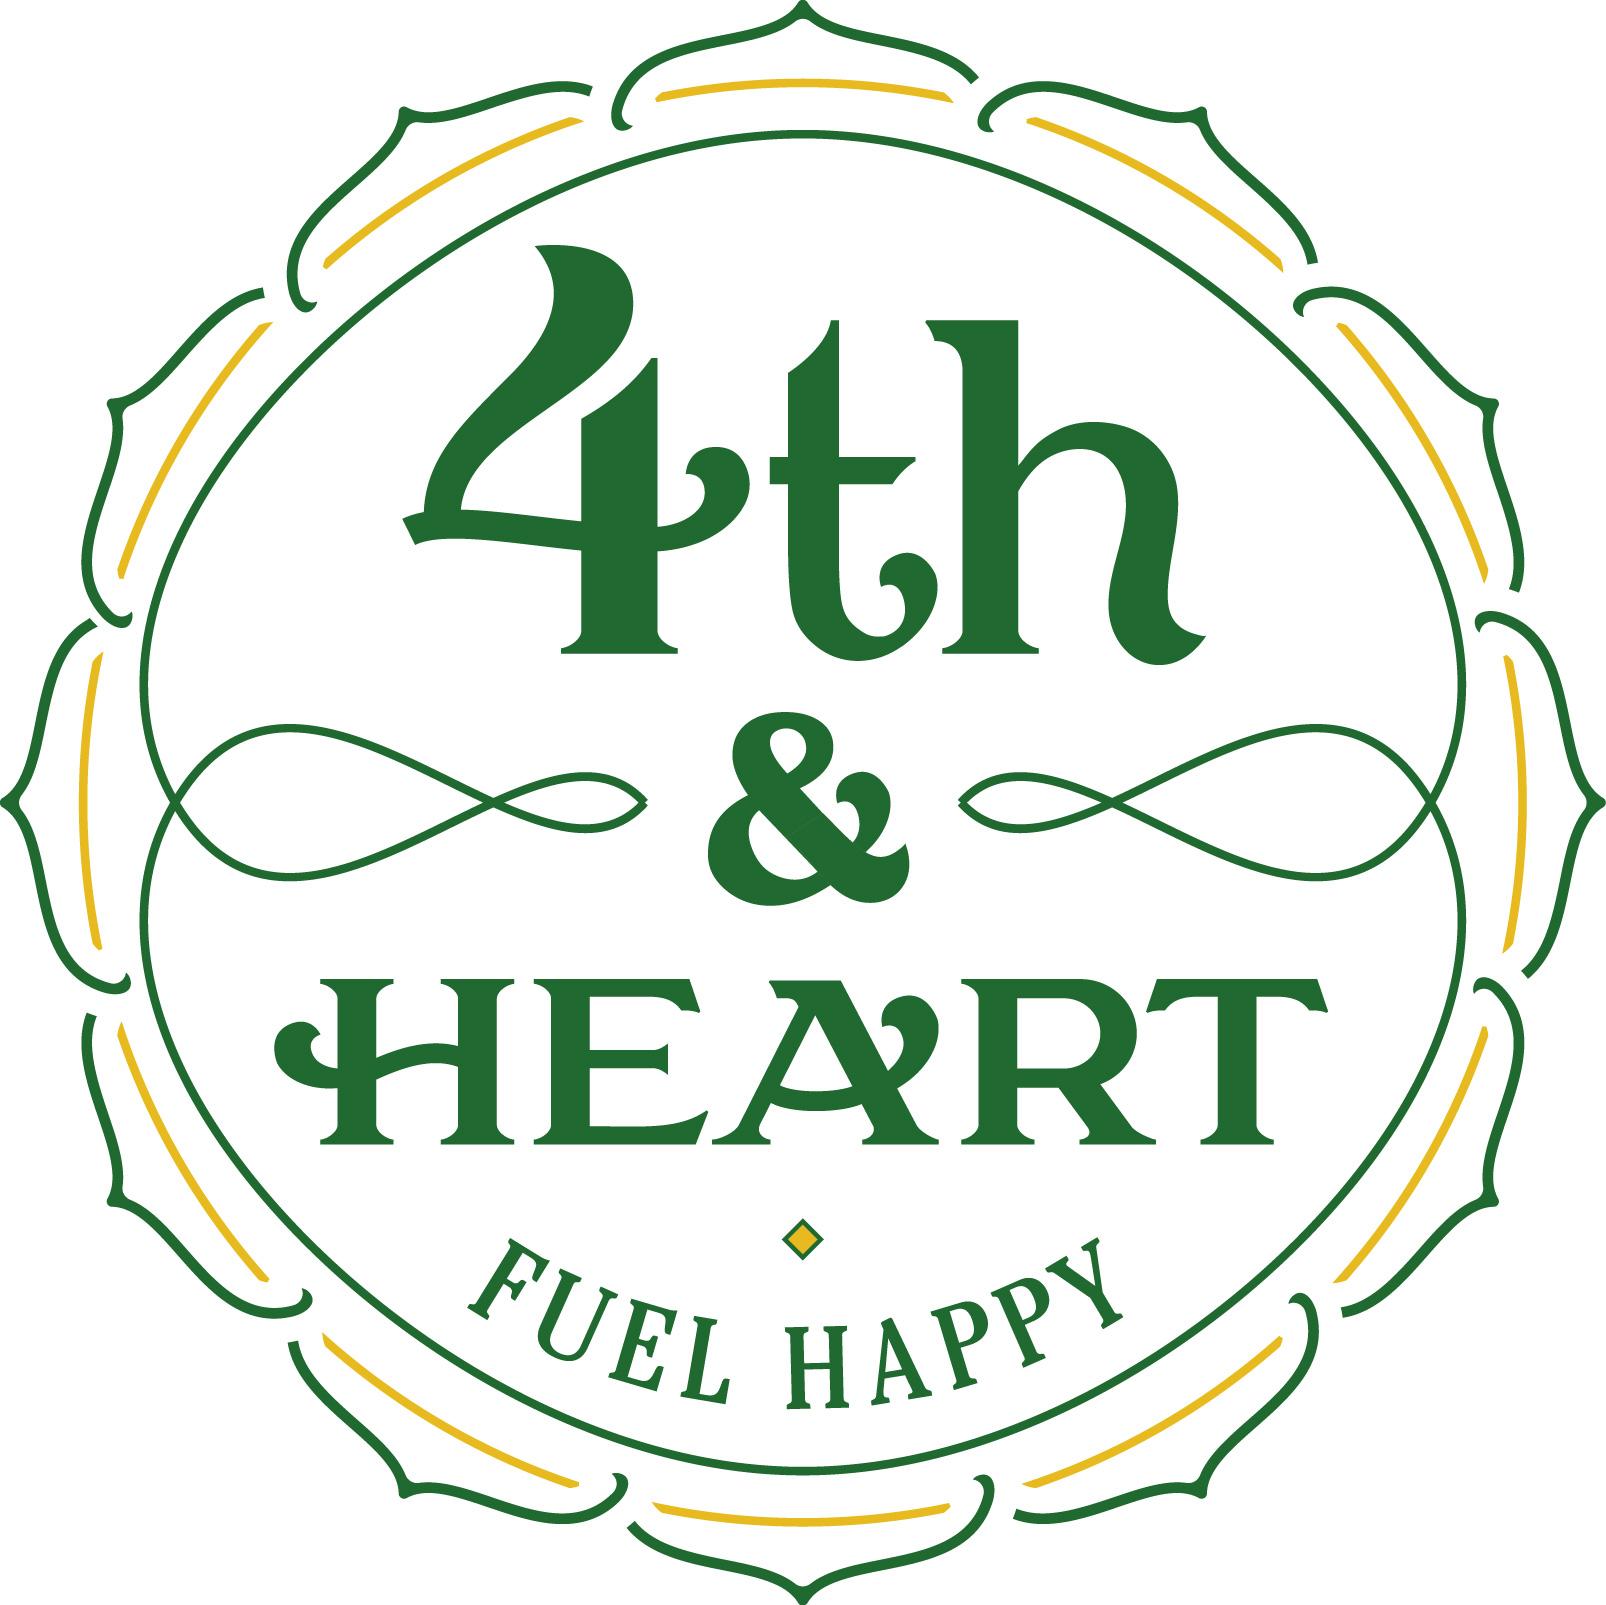 4th & Heart